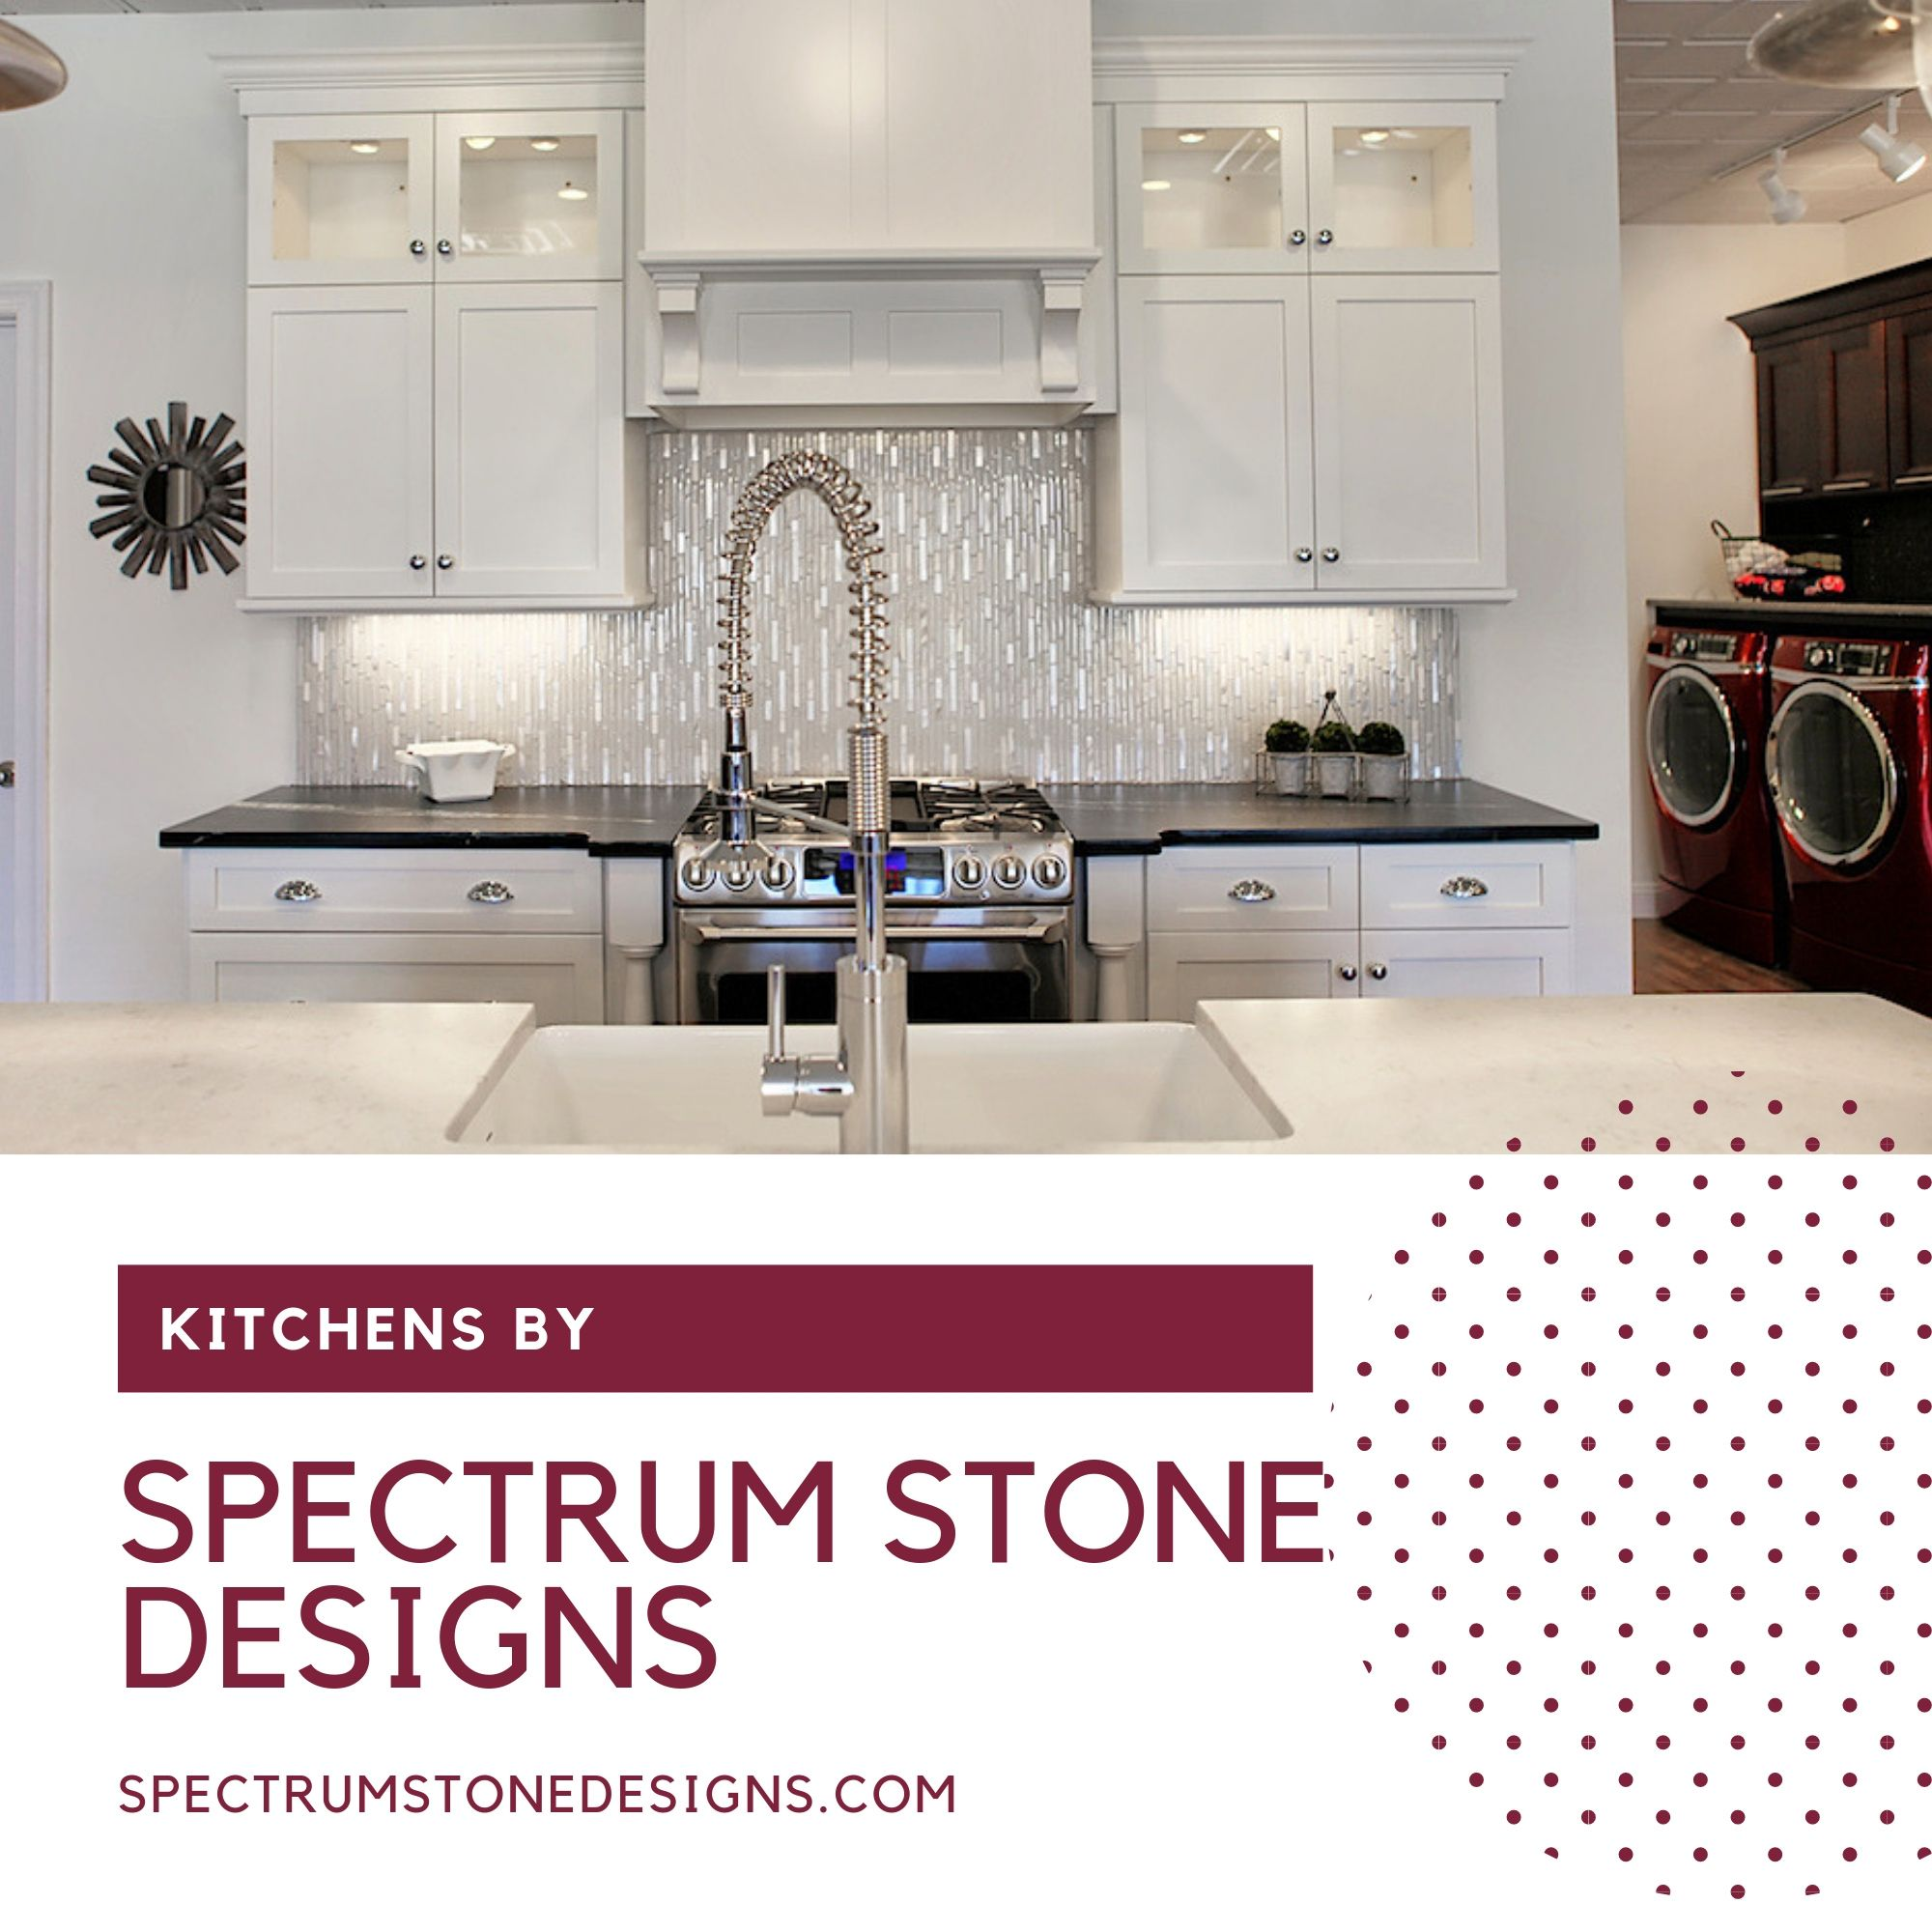 Granite Marble Quartz Naturalstone Spectrumstonedesigns Lynchburg Charlottesville Roanoke Vir Stone Design Natural Stone Countertops Stone Countertops